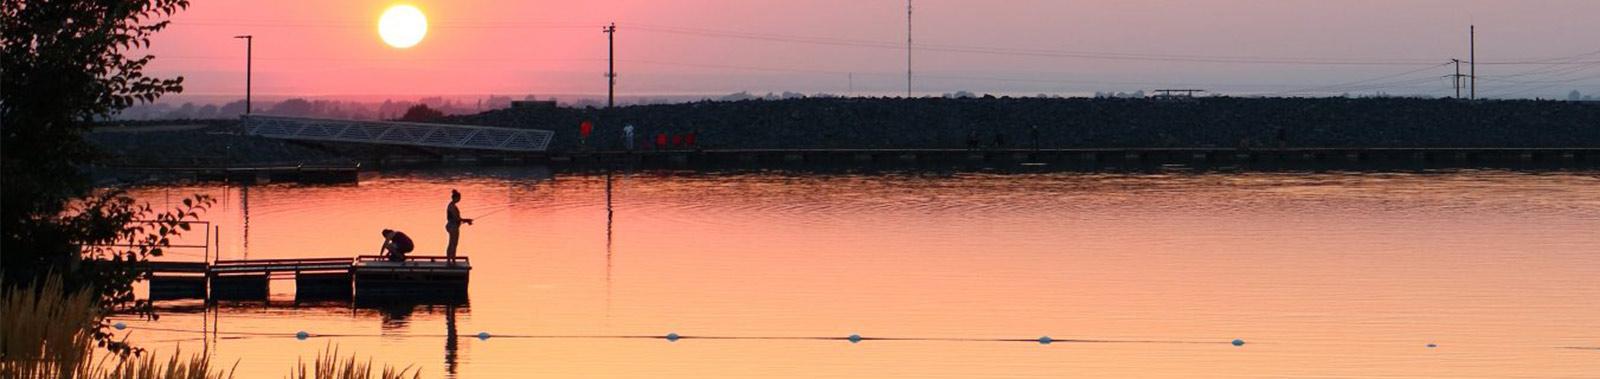 image: fishing at sunset